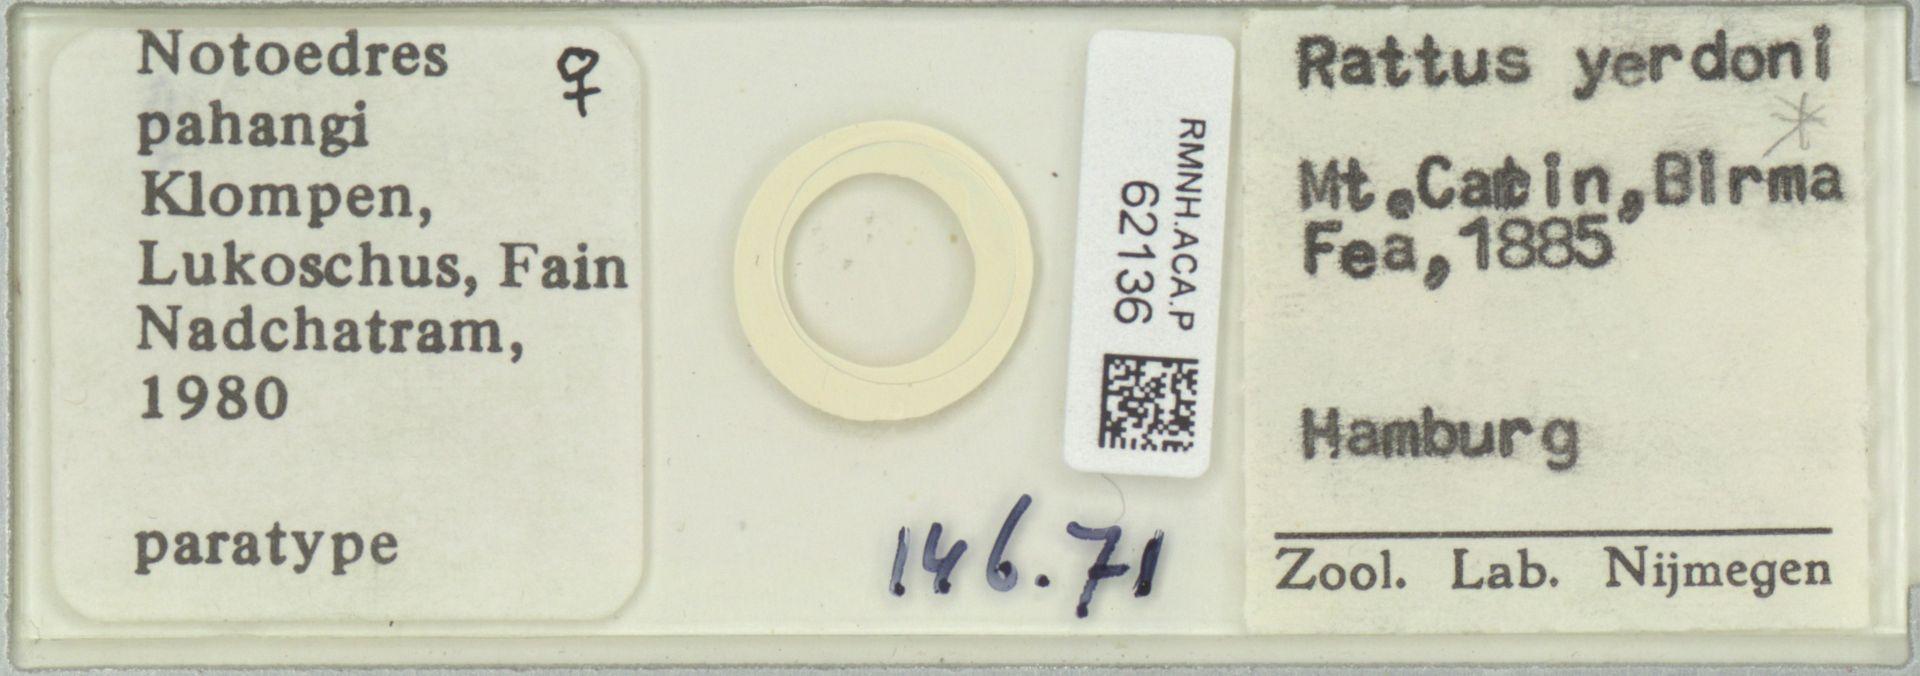 RMNH.ACA.P.62136 | Notoedres pahangi Klompen, Lukoschus, Fain & Nadchatram, 1980